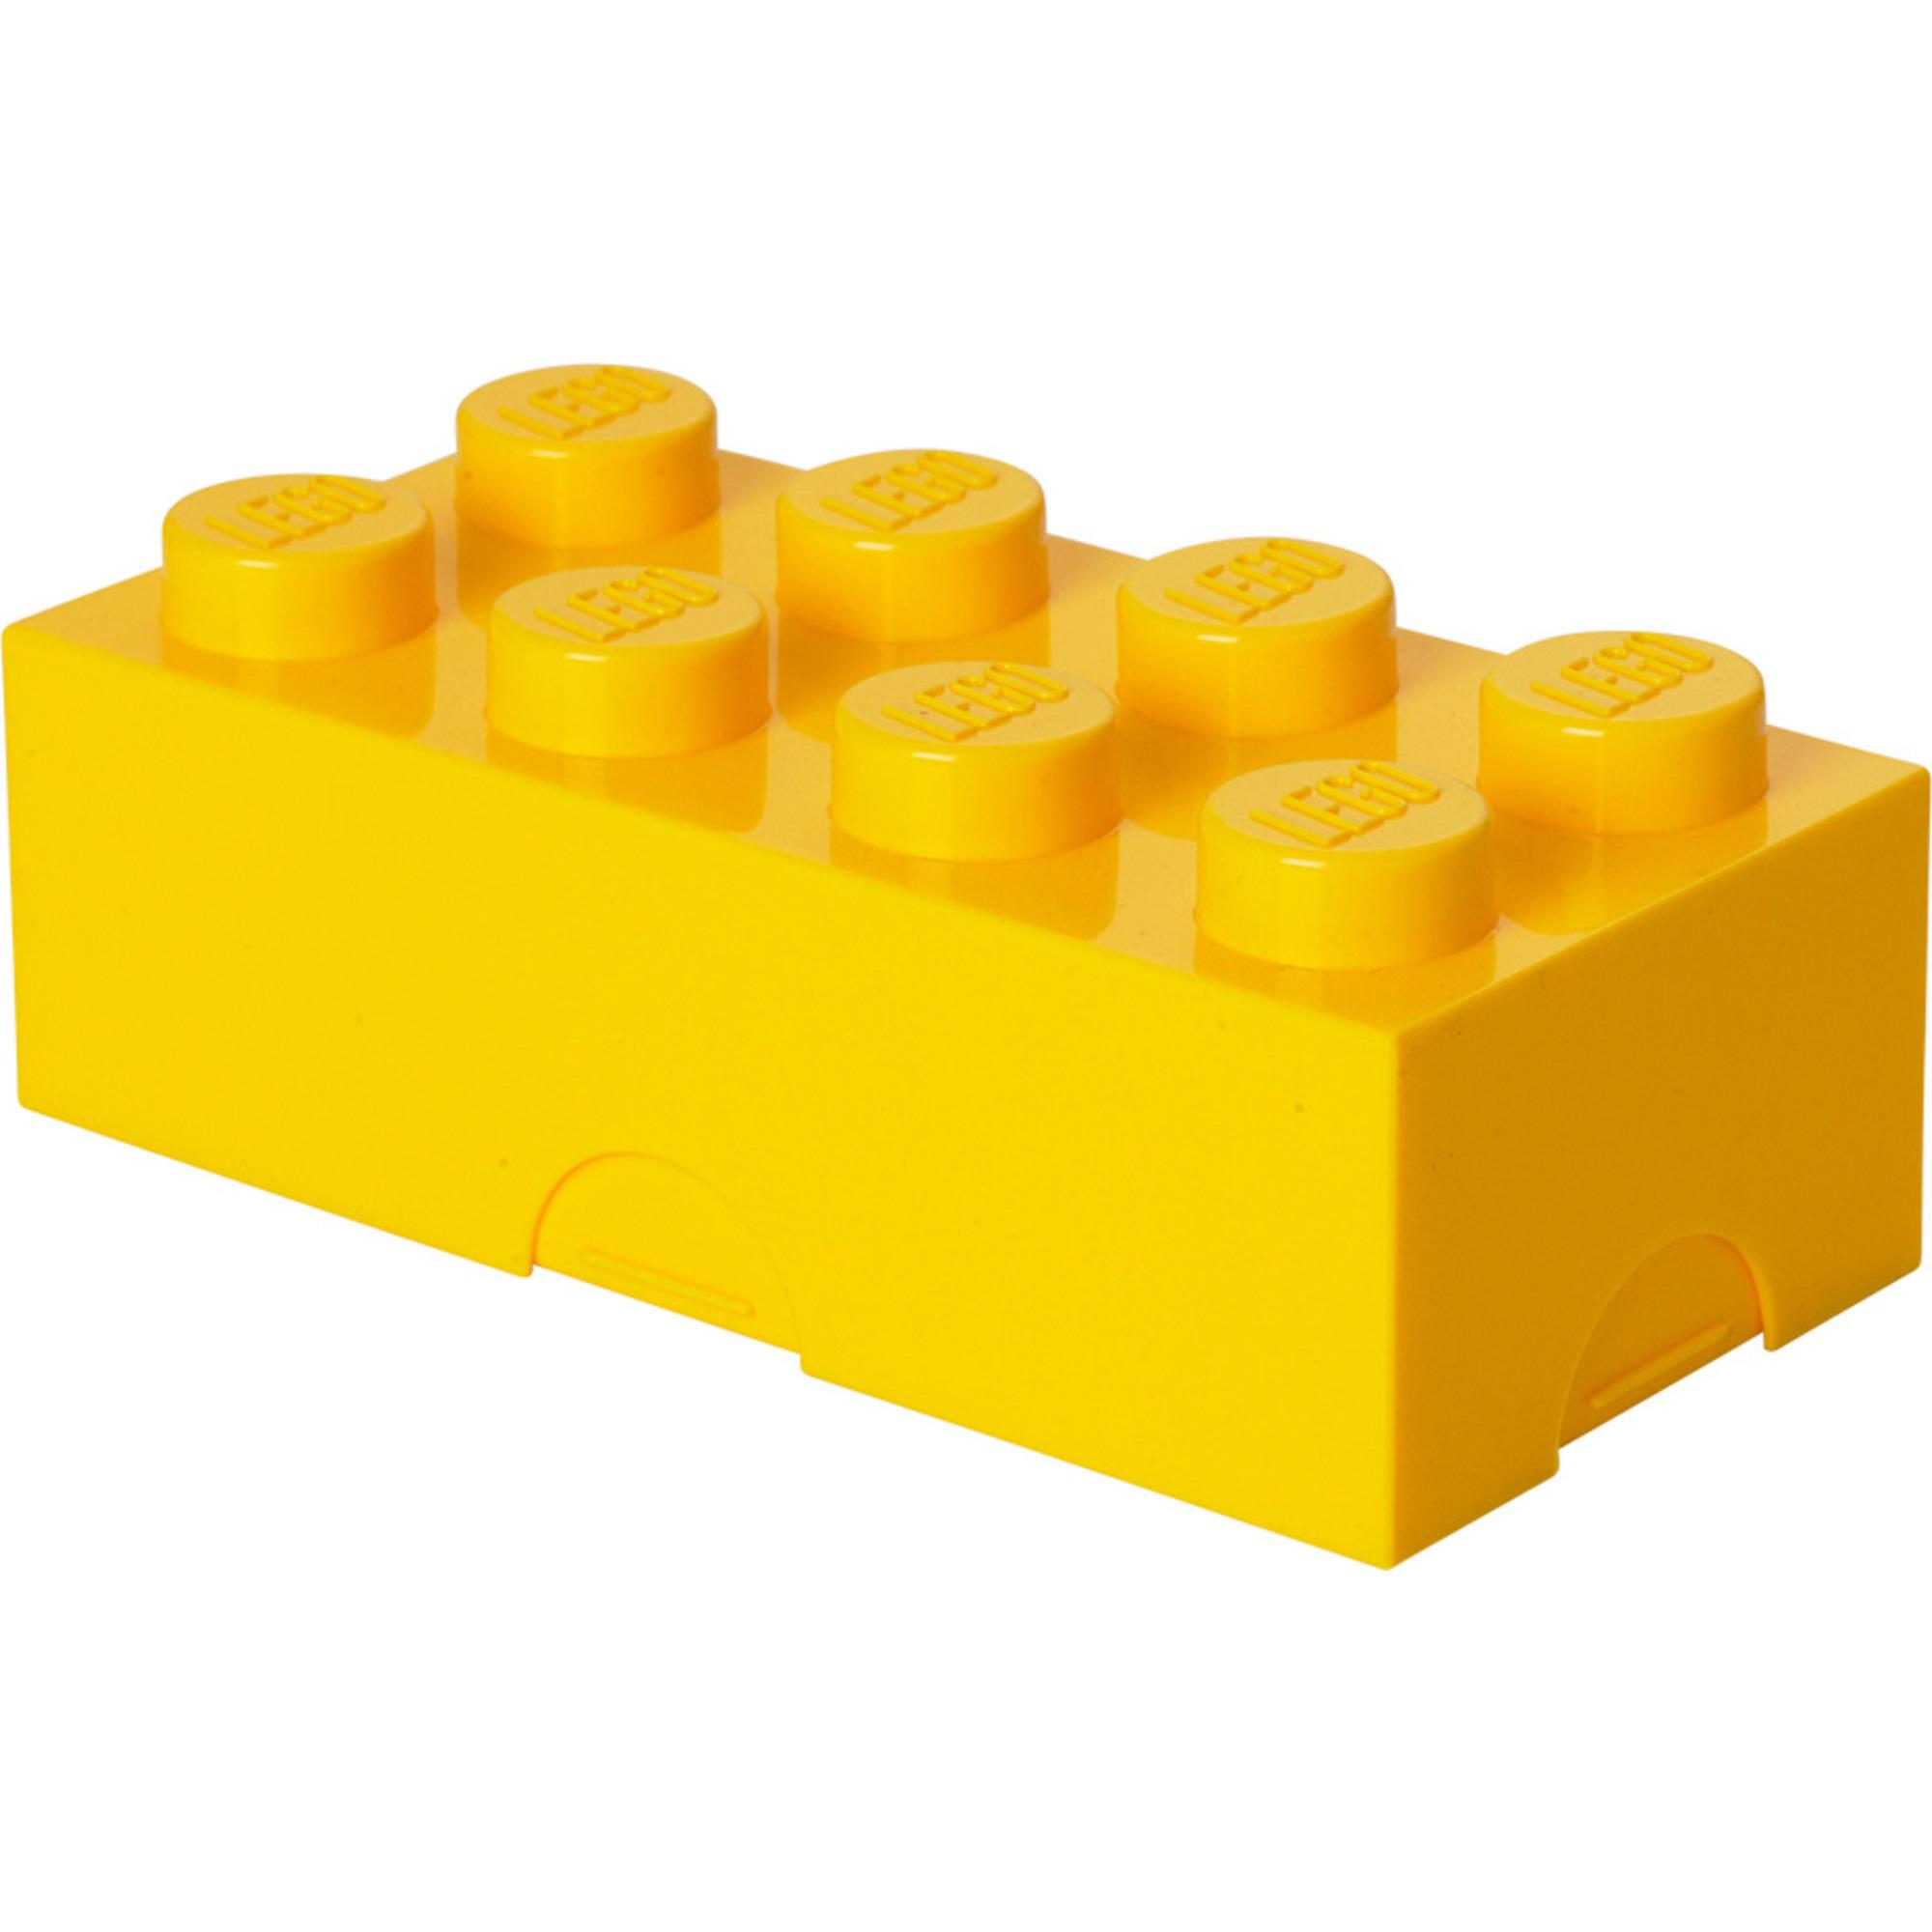 LEGO Matlåda Classic Gul